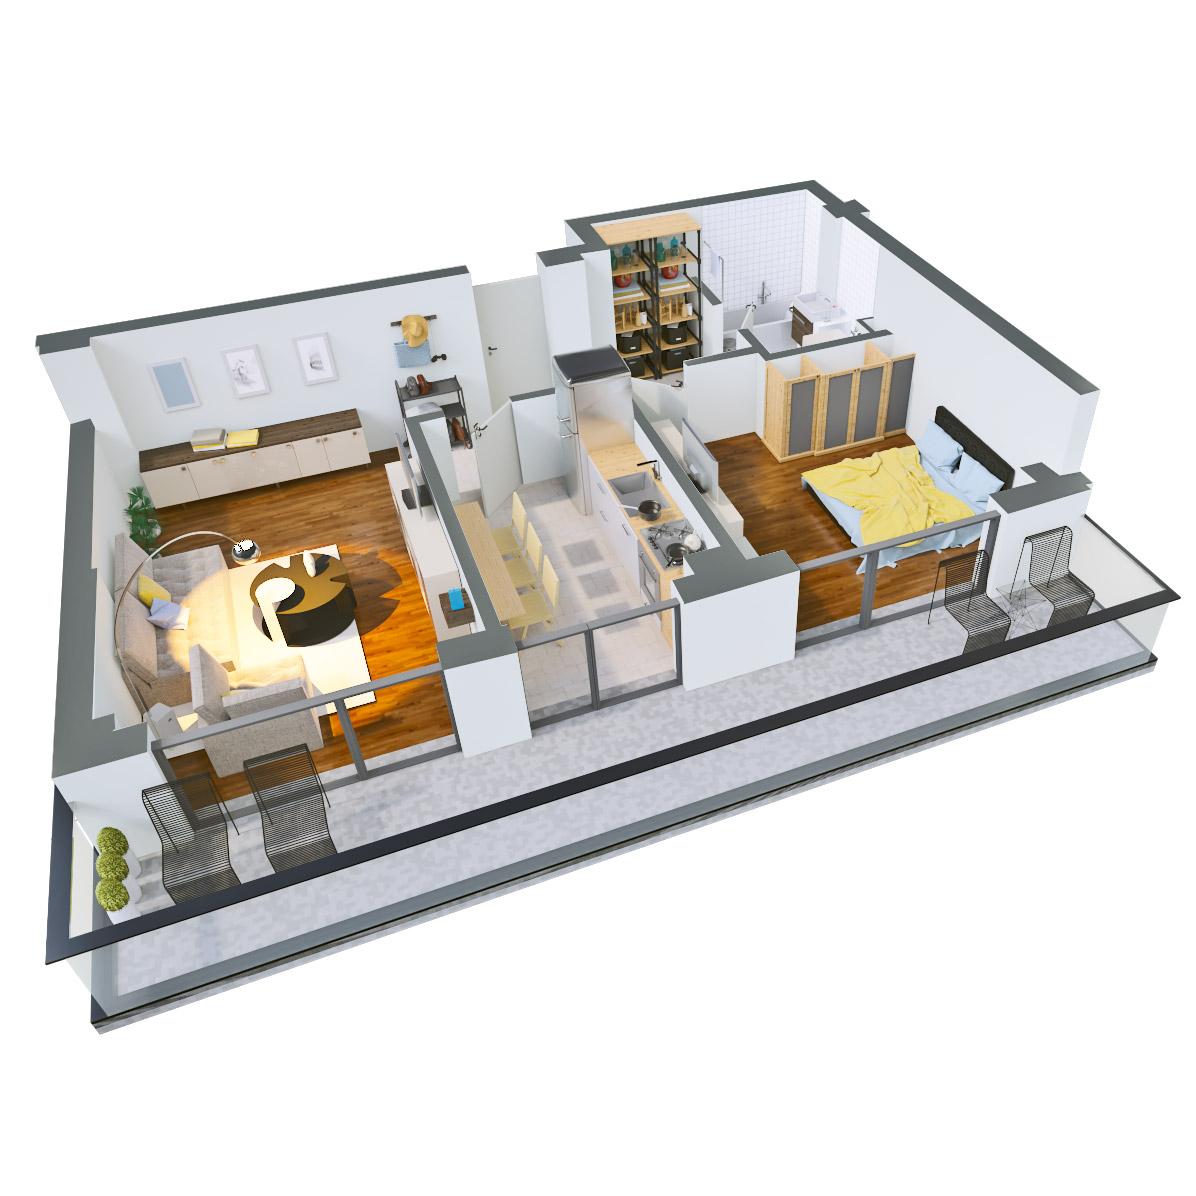 Apartament 2 camere de vanzare Bucuresti - Catedral Residence - Marriott, Piata Unirii, 13 Septembrie, Izvor - Tip 4 - T2 - B